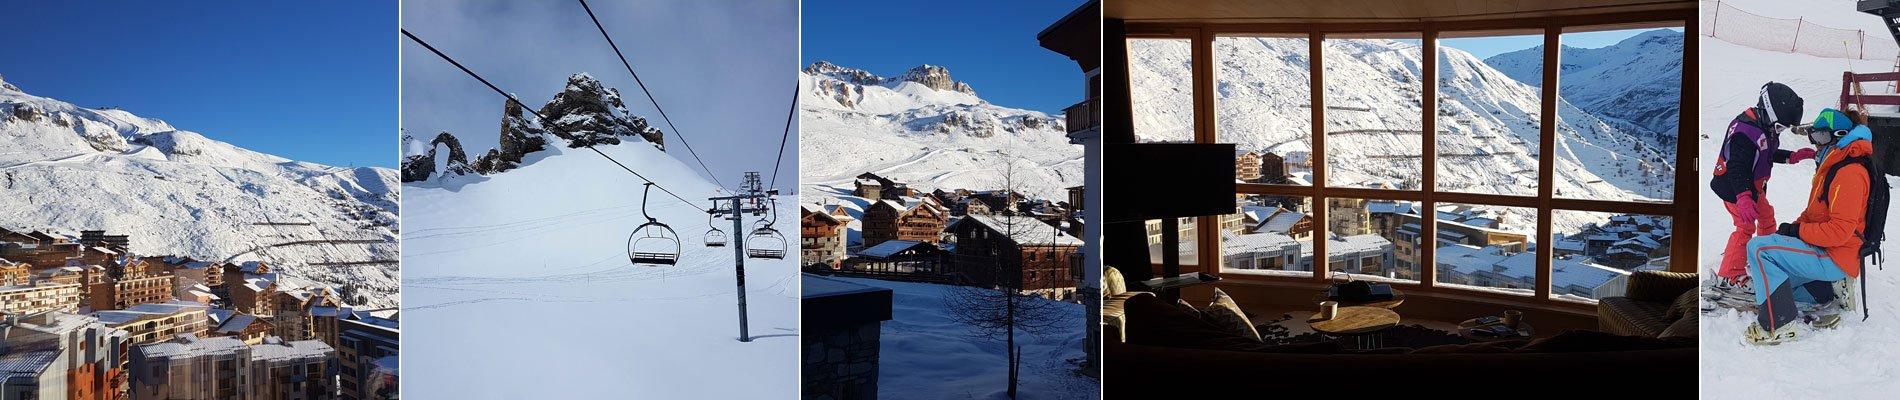 collage-kids-ski-week-tignes-het-frankrijk-huis-2018.jpg